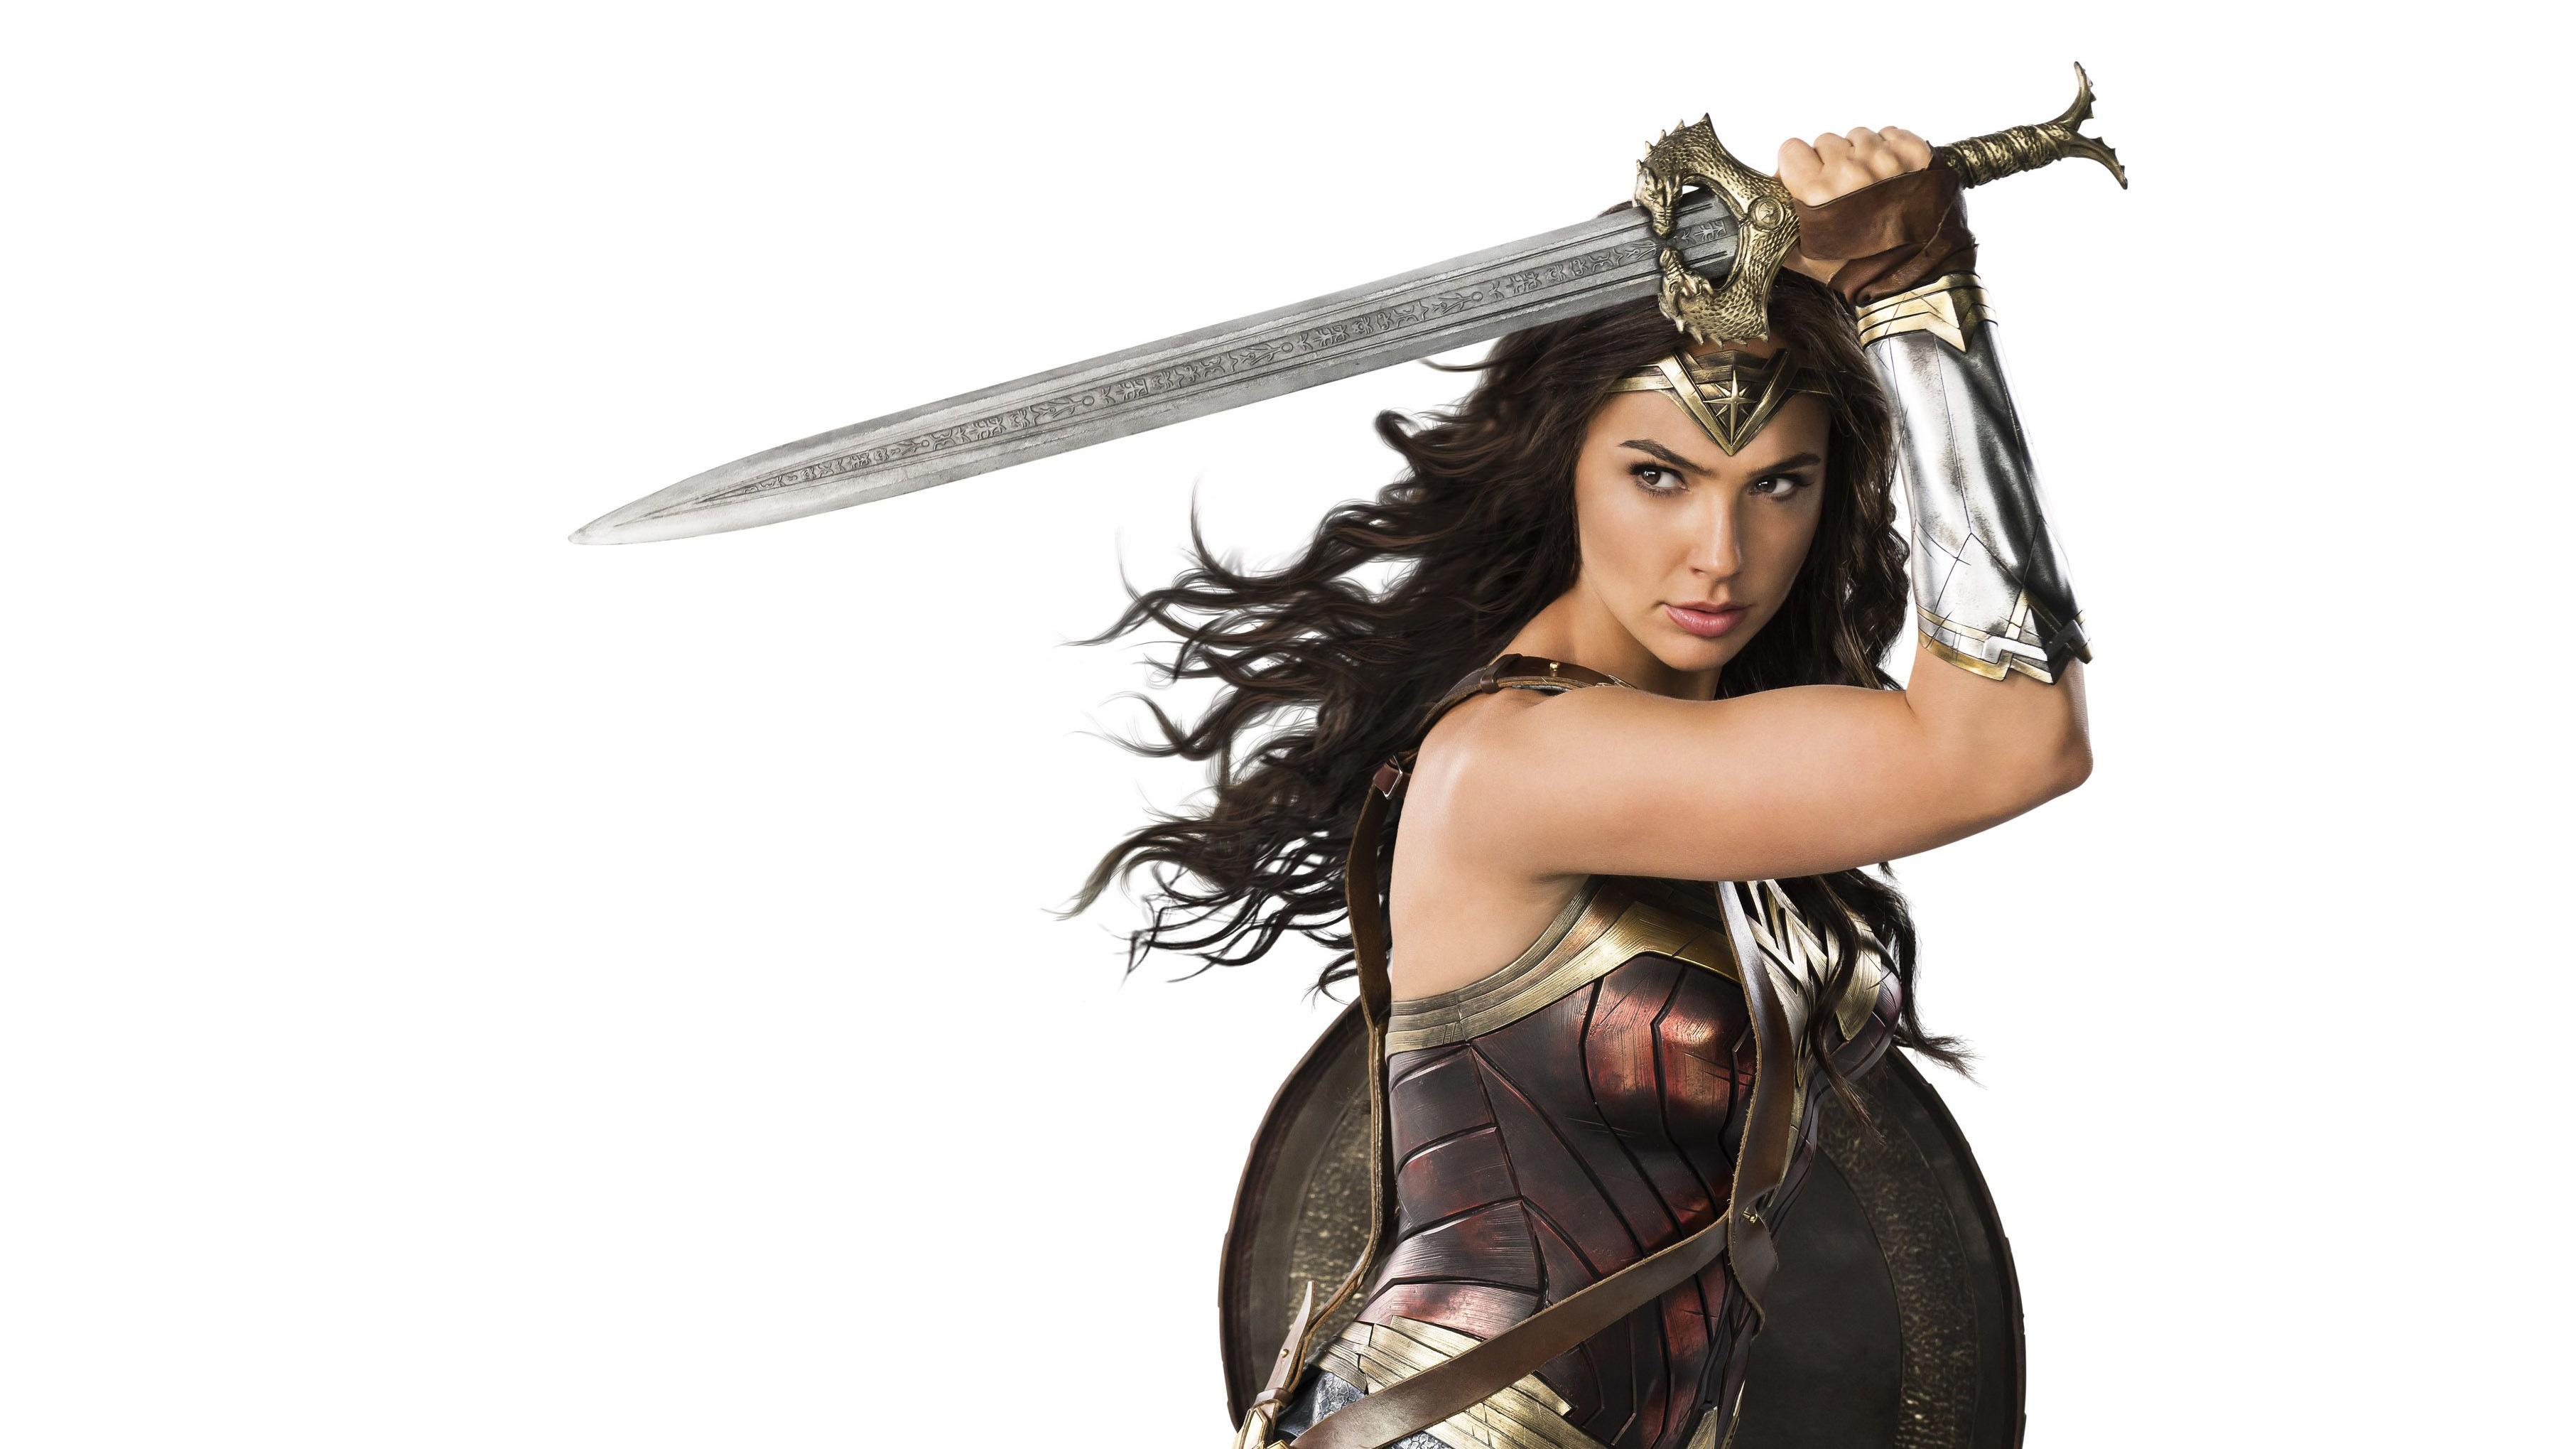 Wonder Woman Movie 4k Hd Desktop Wallpaper For 4k Ultra Hd Tv: 4k Wonder Woman, HD Superheroes, 4k Wallpapers, Images